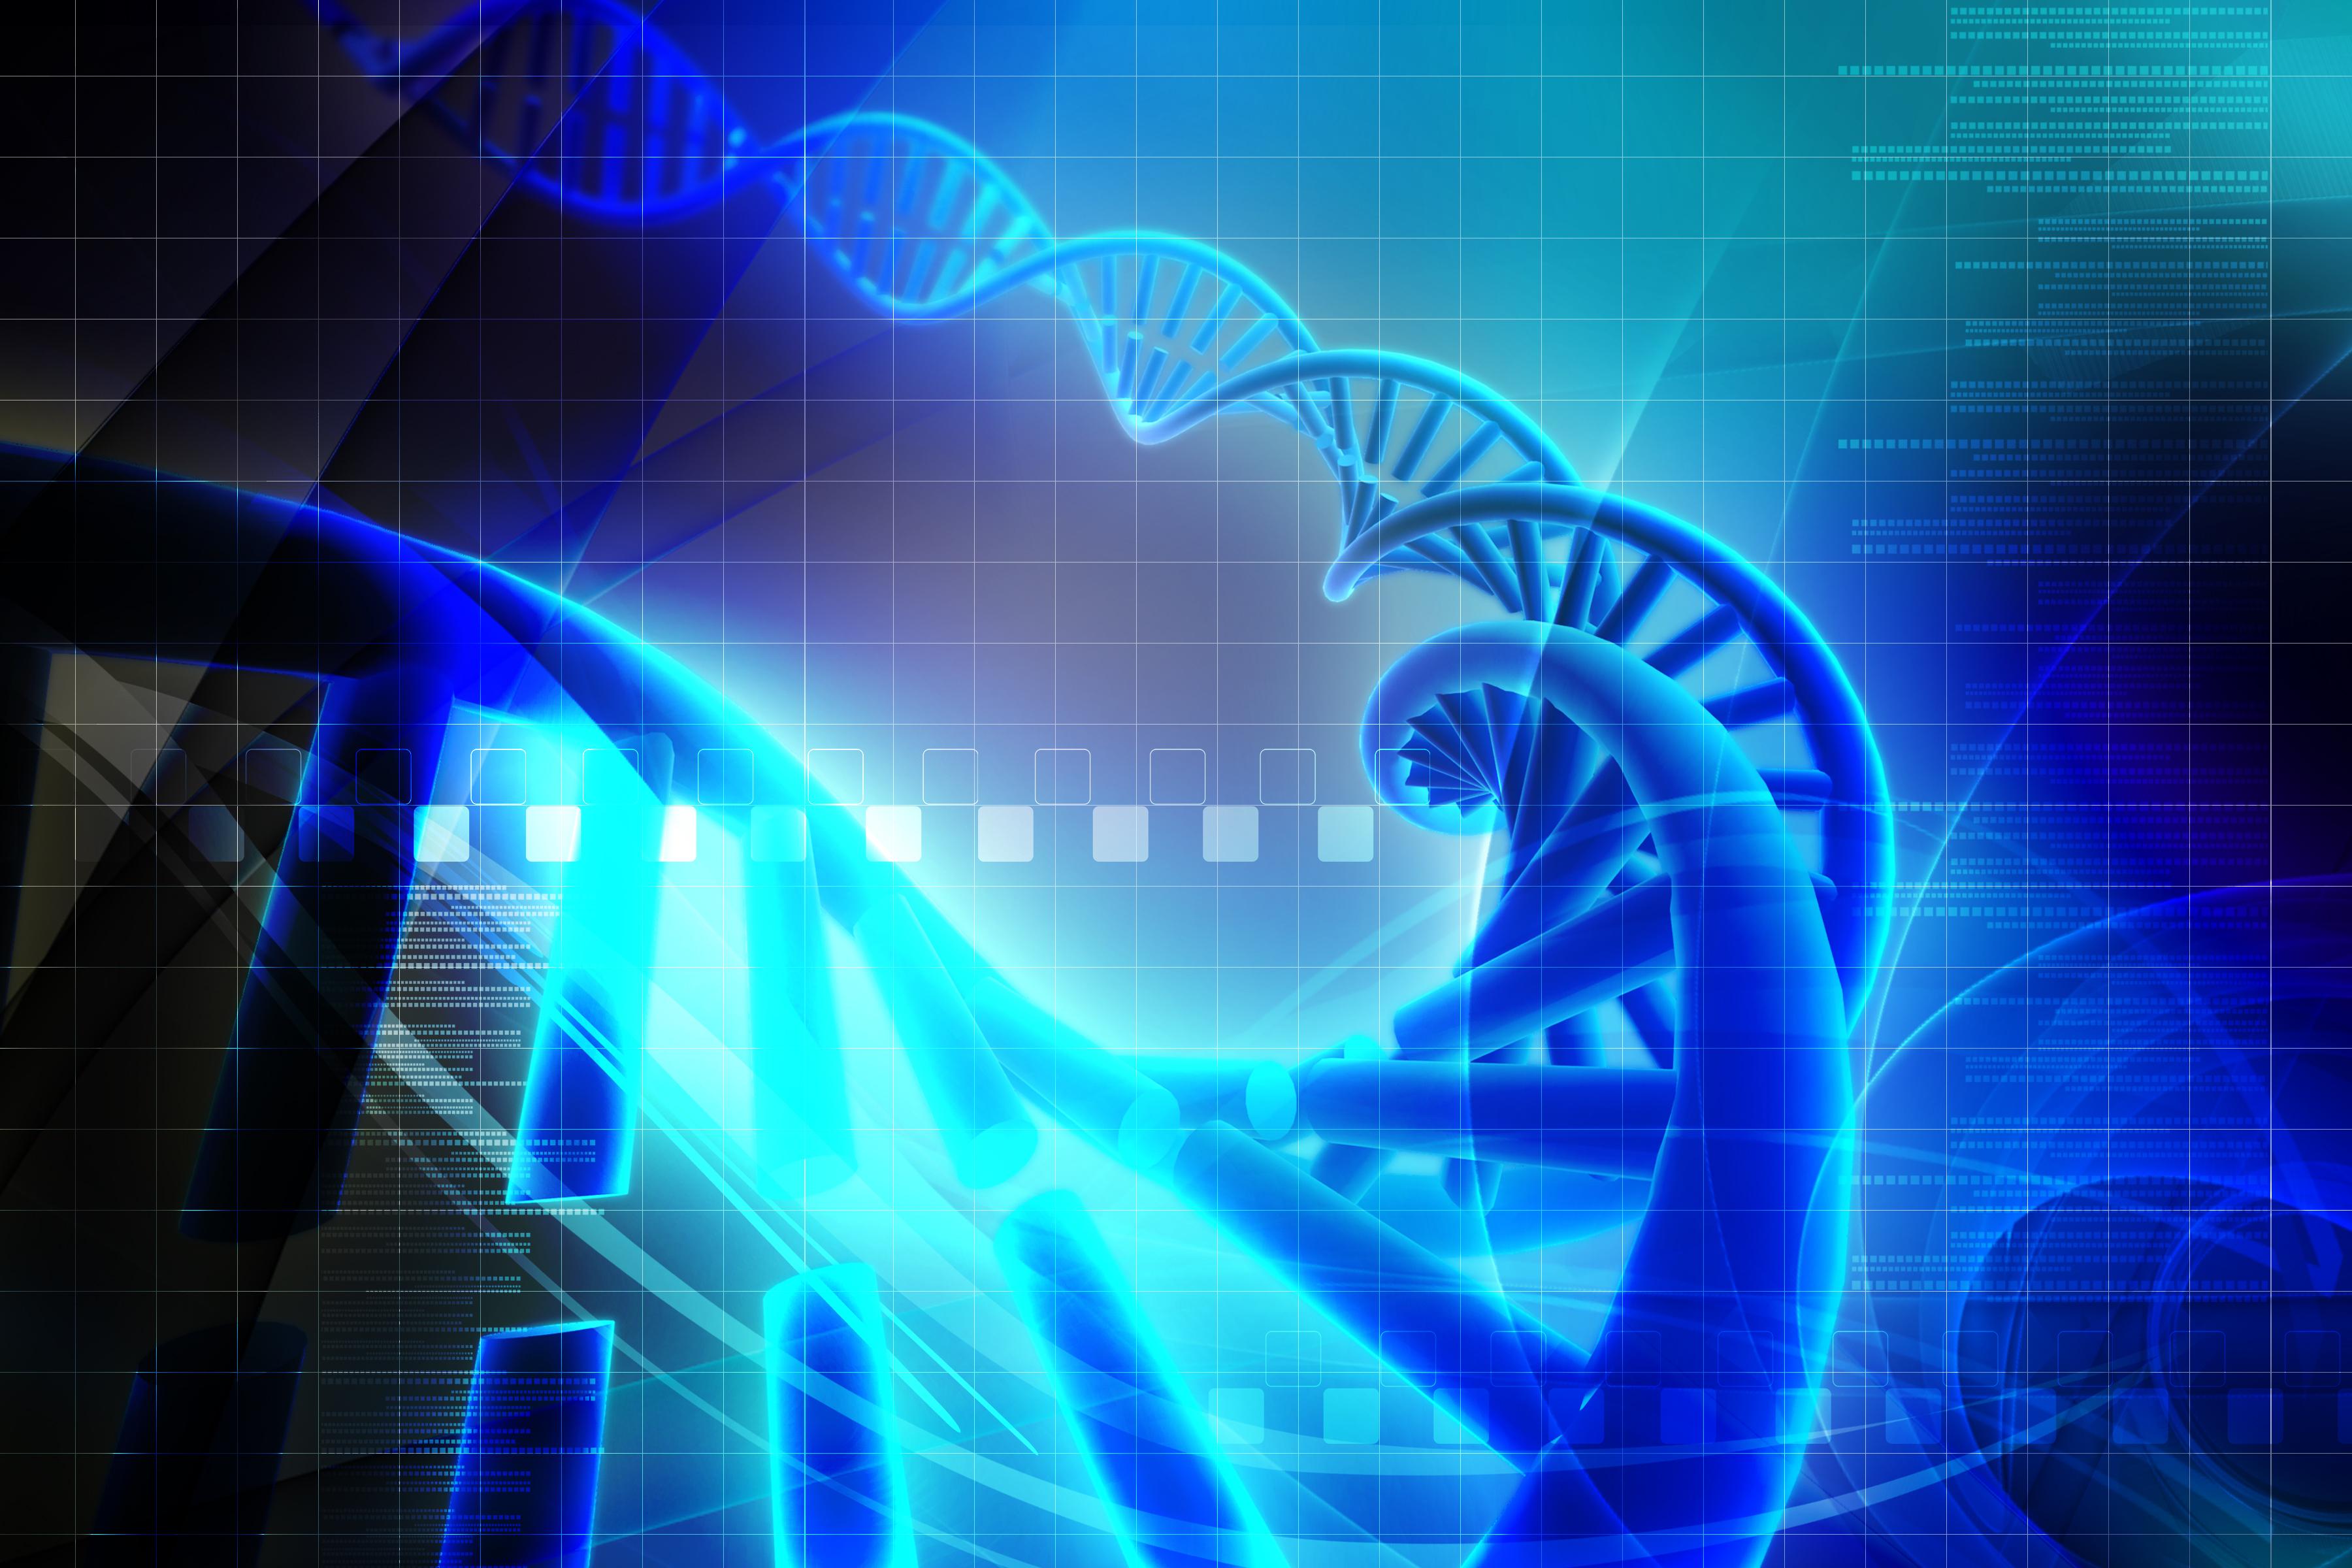 DNA-shutterstock_79393504